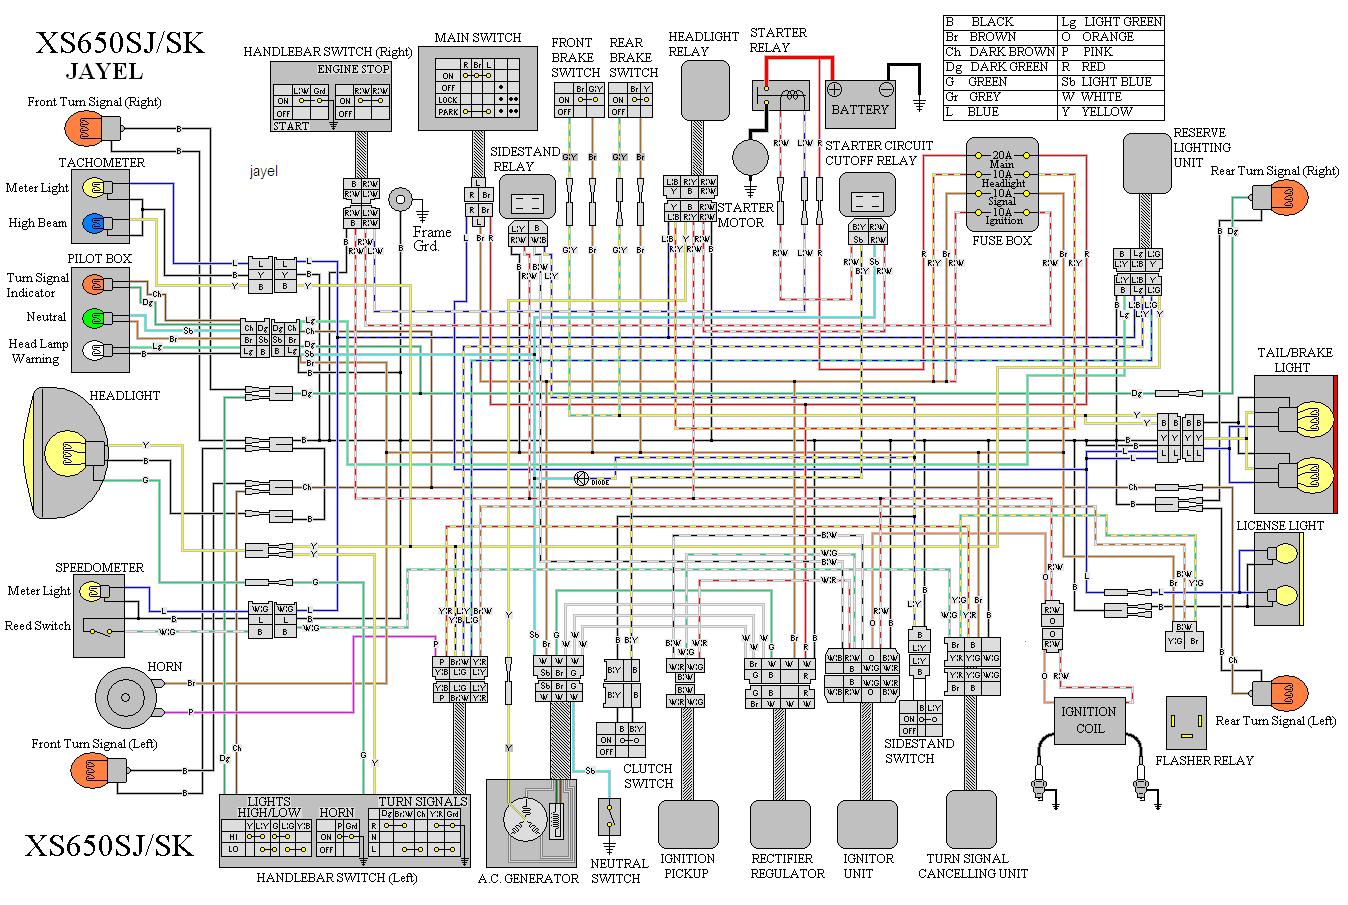 Which Wiring Diagram? | Yamaha XS650 Forum on xj750 wiring diagram, xs400 wiring diagram, cb750 wiring diagram, xs1100 wiring diagram, xv535 wiring diagram, it 250 wiring diagram, yz426f wiring diagram, xt350 wiring diagram, xj550 wiring diagram, xs360 wiring diagram, fj1100 wiring diagram, xj650 wiring diagram, chopper wiring diagram, xs850 wiring diagram, xvs650 wiring diagram, xvz1300 wiring diagram, virago wiring diagram, xv920 wiring diagram, fz700 wiring diagram, yamaha wiring diagram,